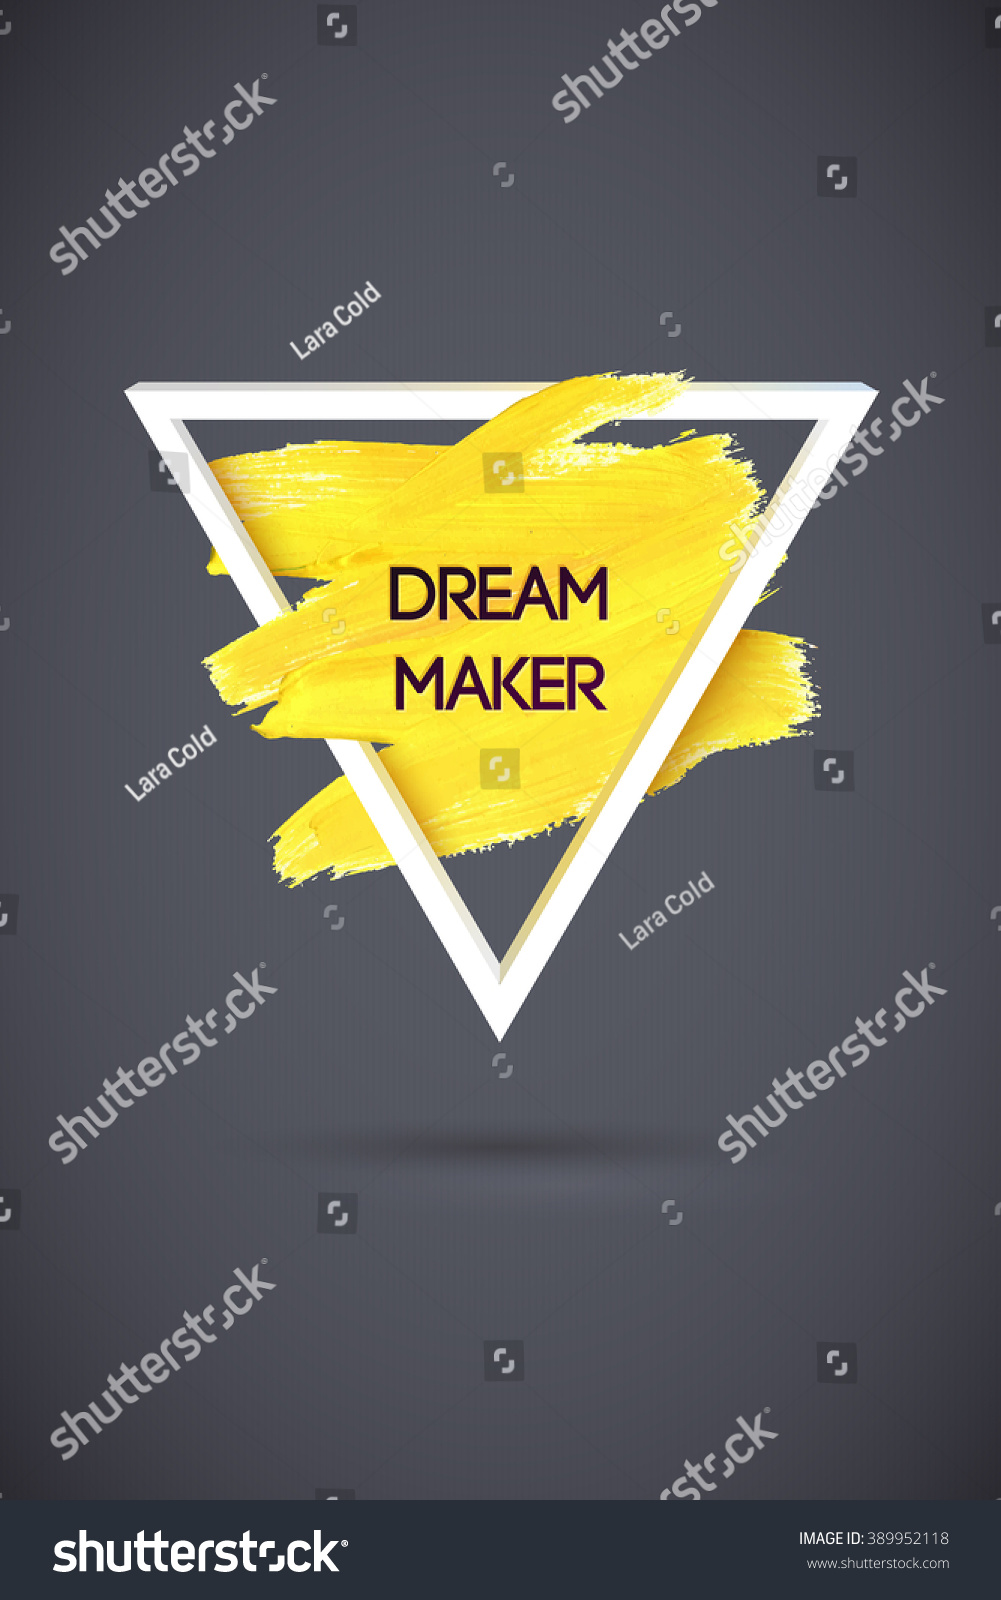 Poster design maker - Poster Design Maker Love Maker Motivate Artistic Poster Design Template Typography Card Inspire Yourself Vector